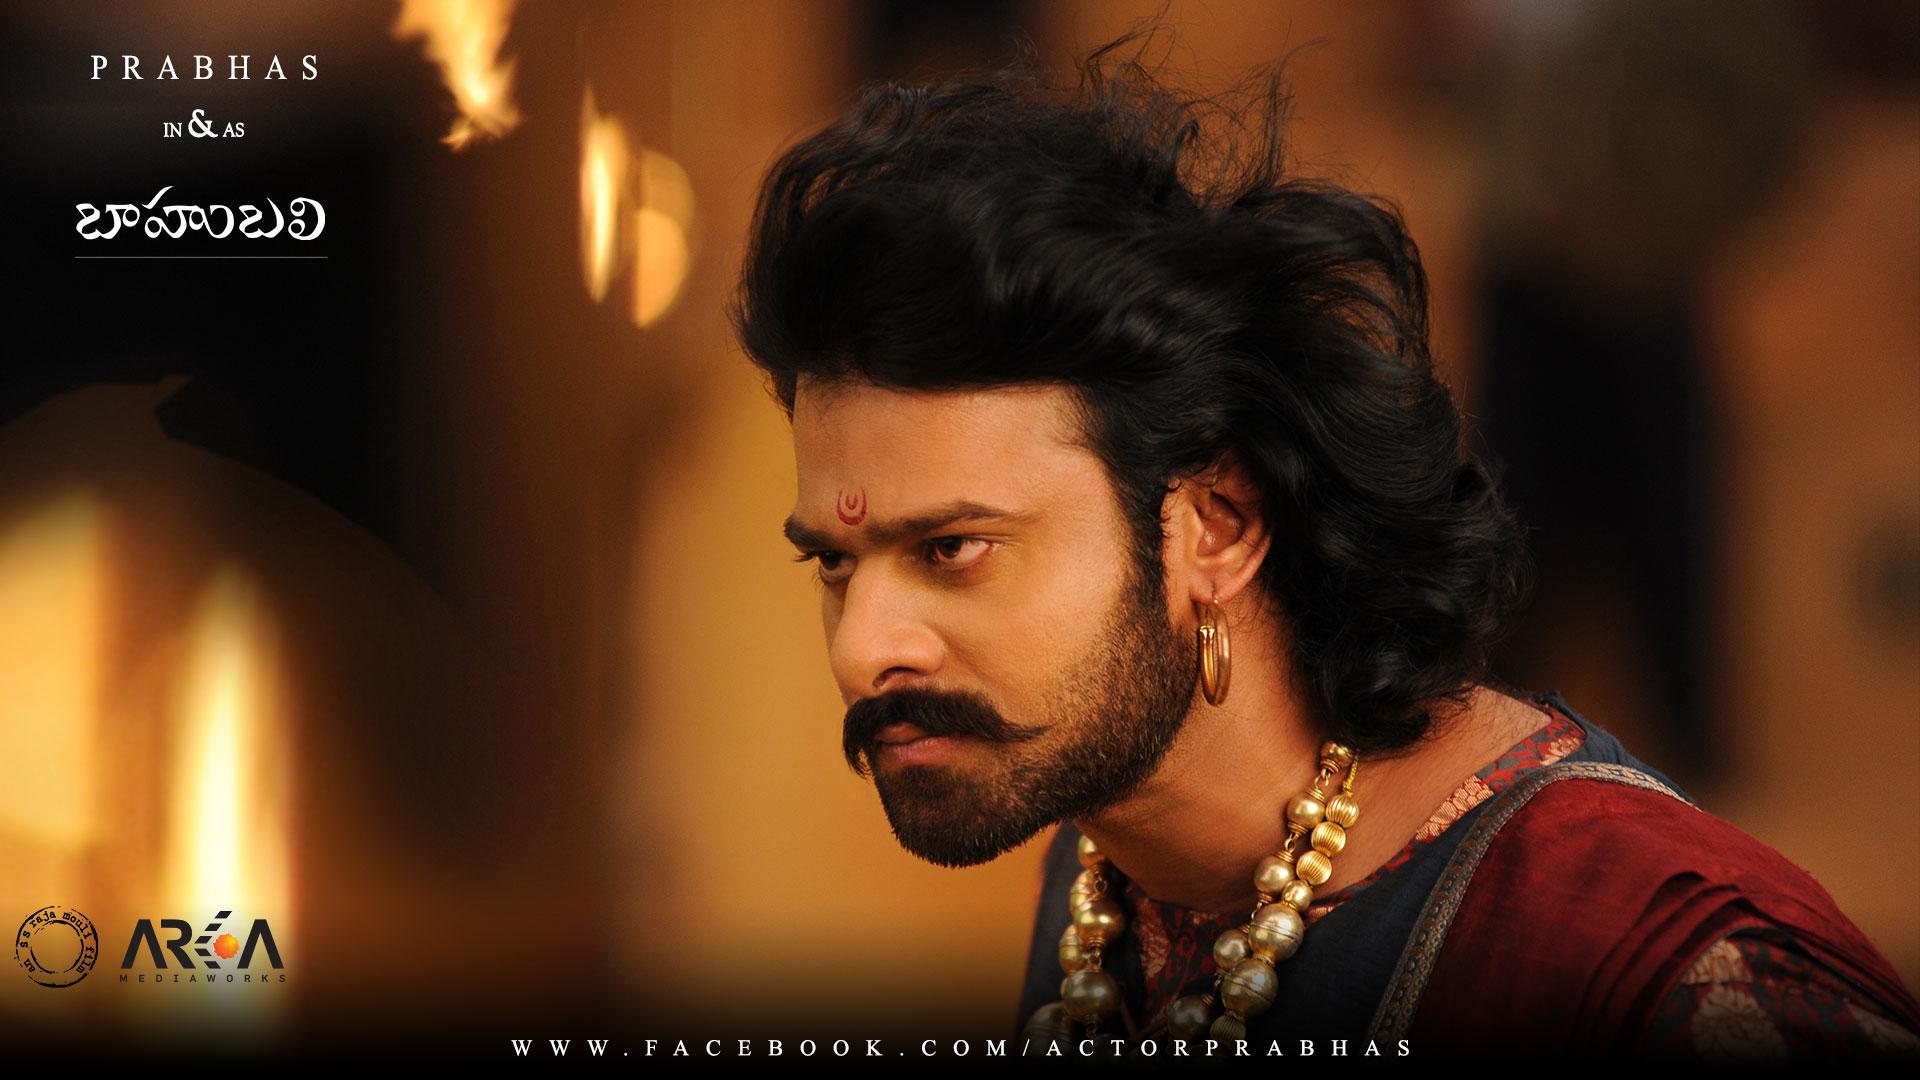 Baahubali 2 Hero Prabhas New Images Hd: Prabhas Images, HD Photos, Biography & Latest News